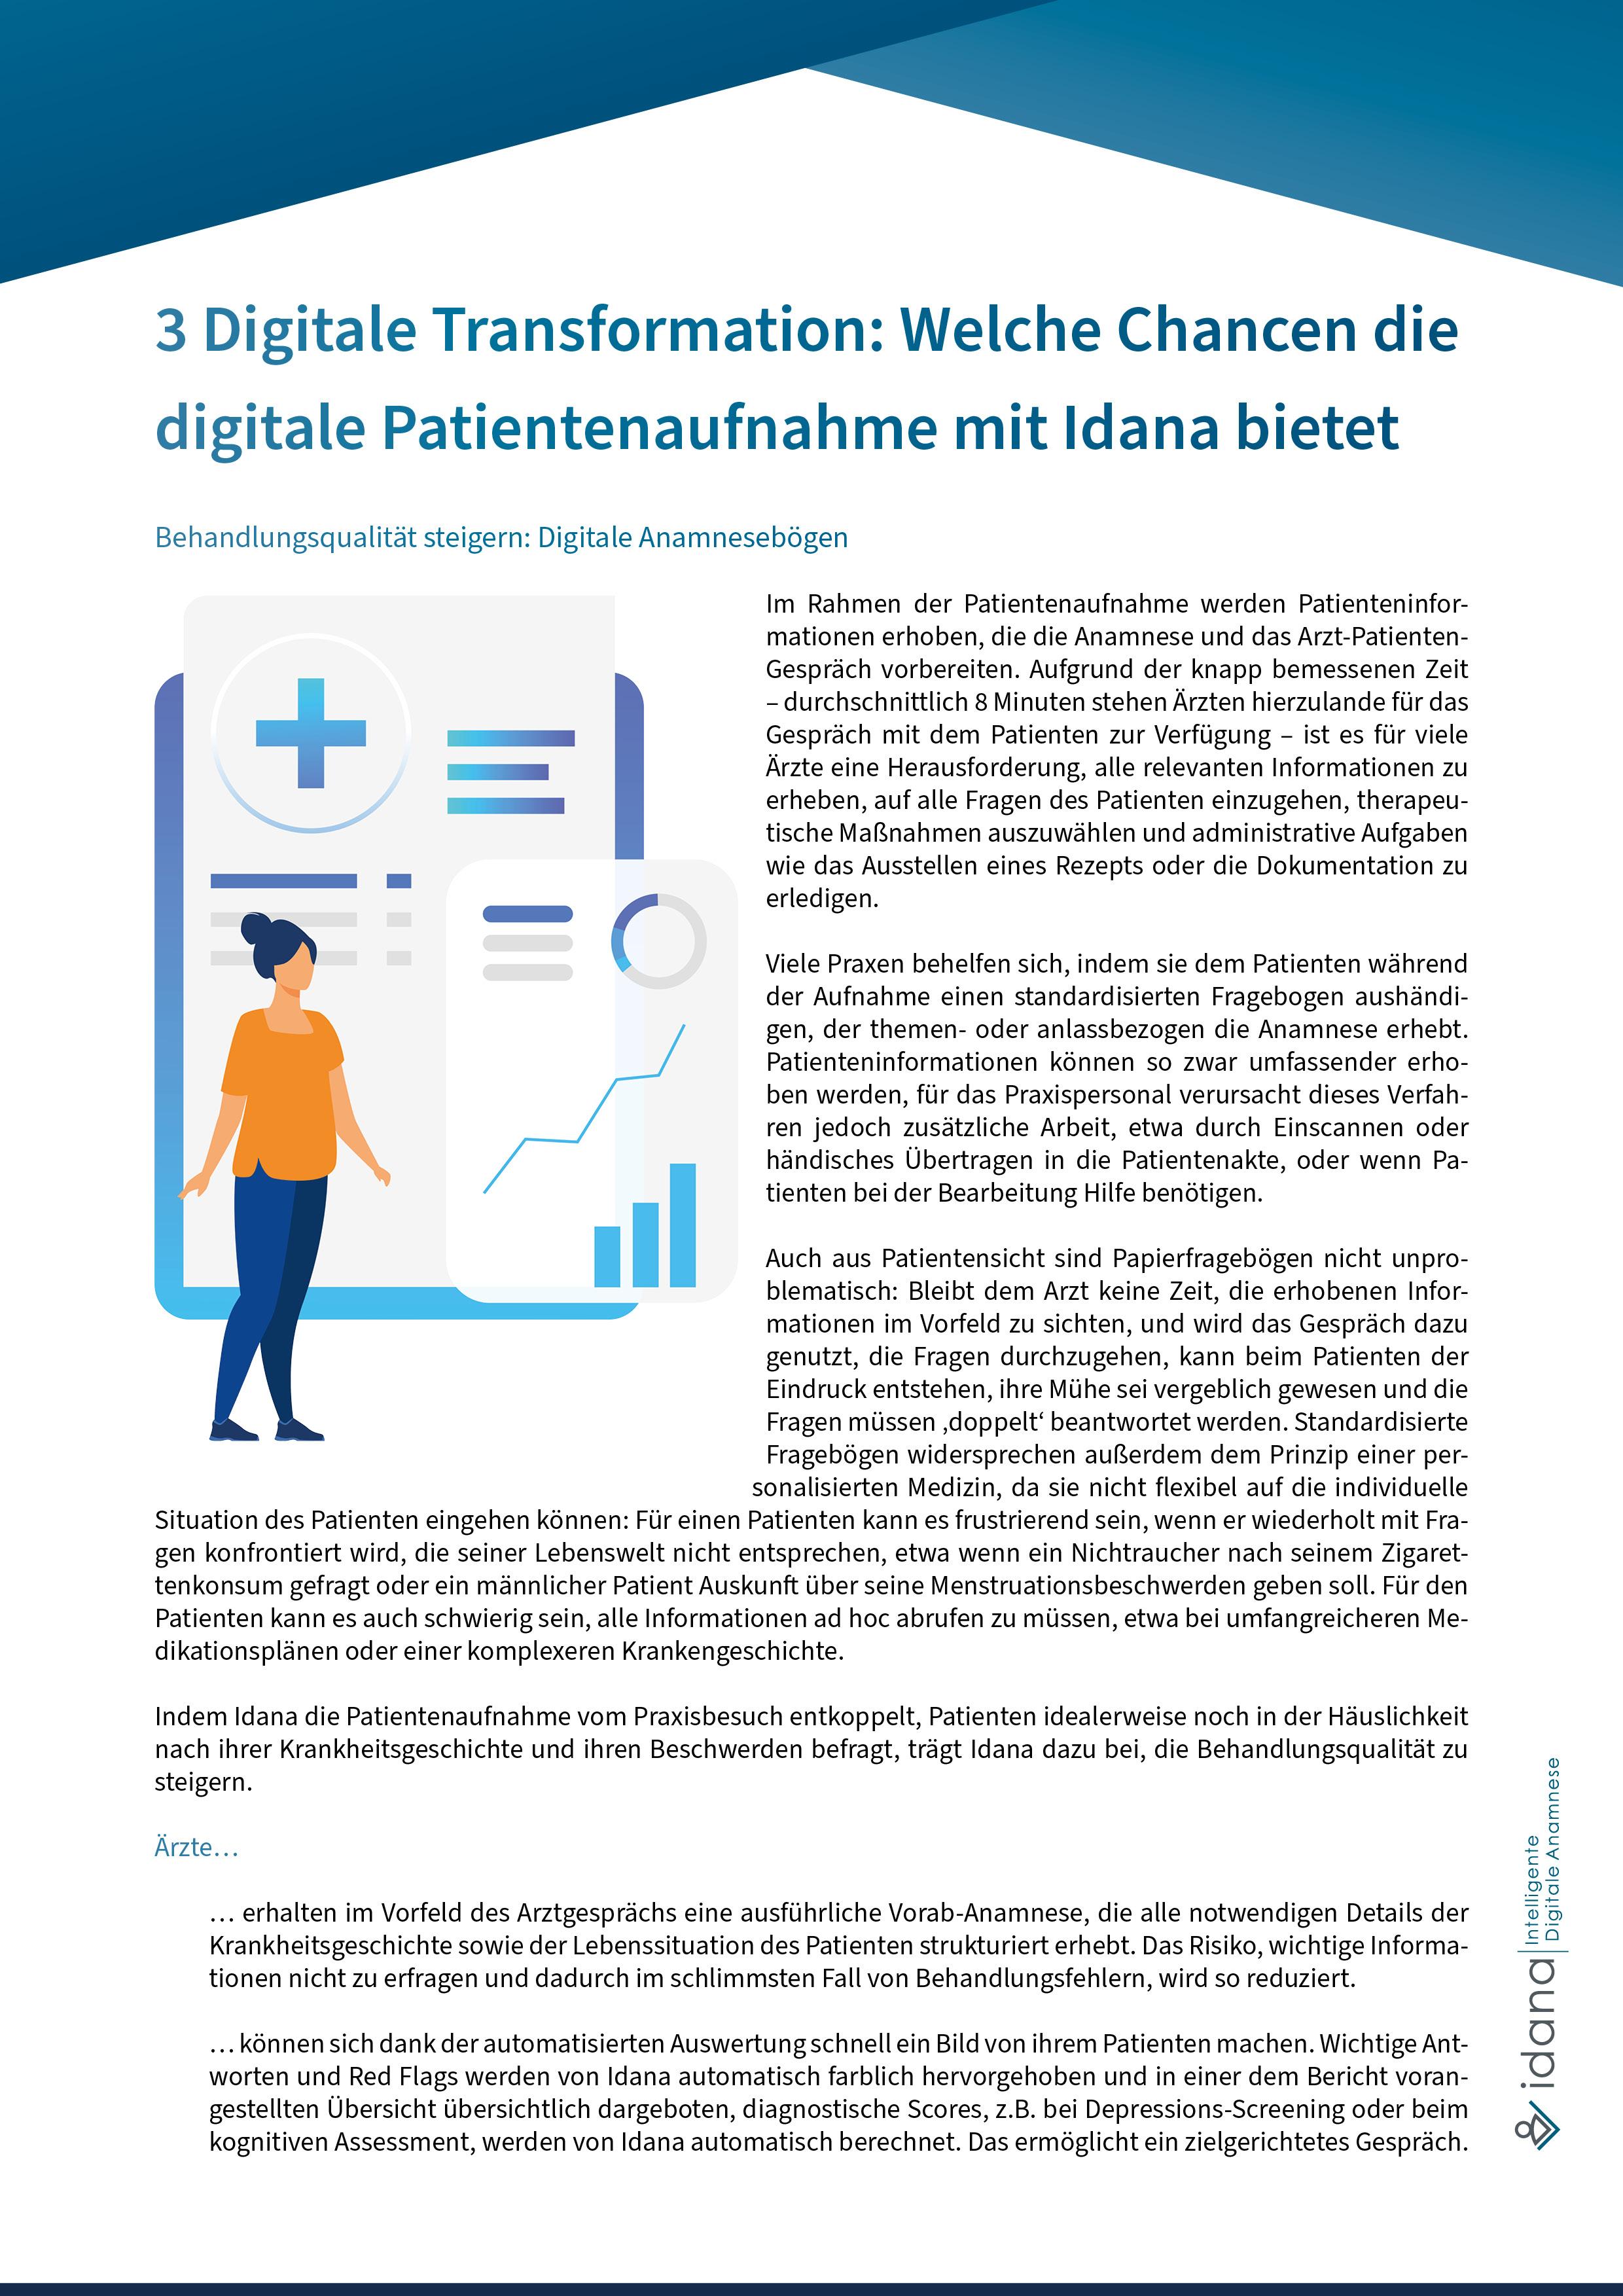 eBook _Digitale Patientenaufnahme in der Hausarztpraxis_7